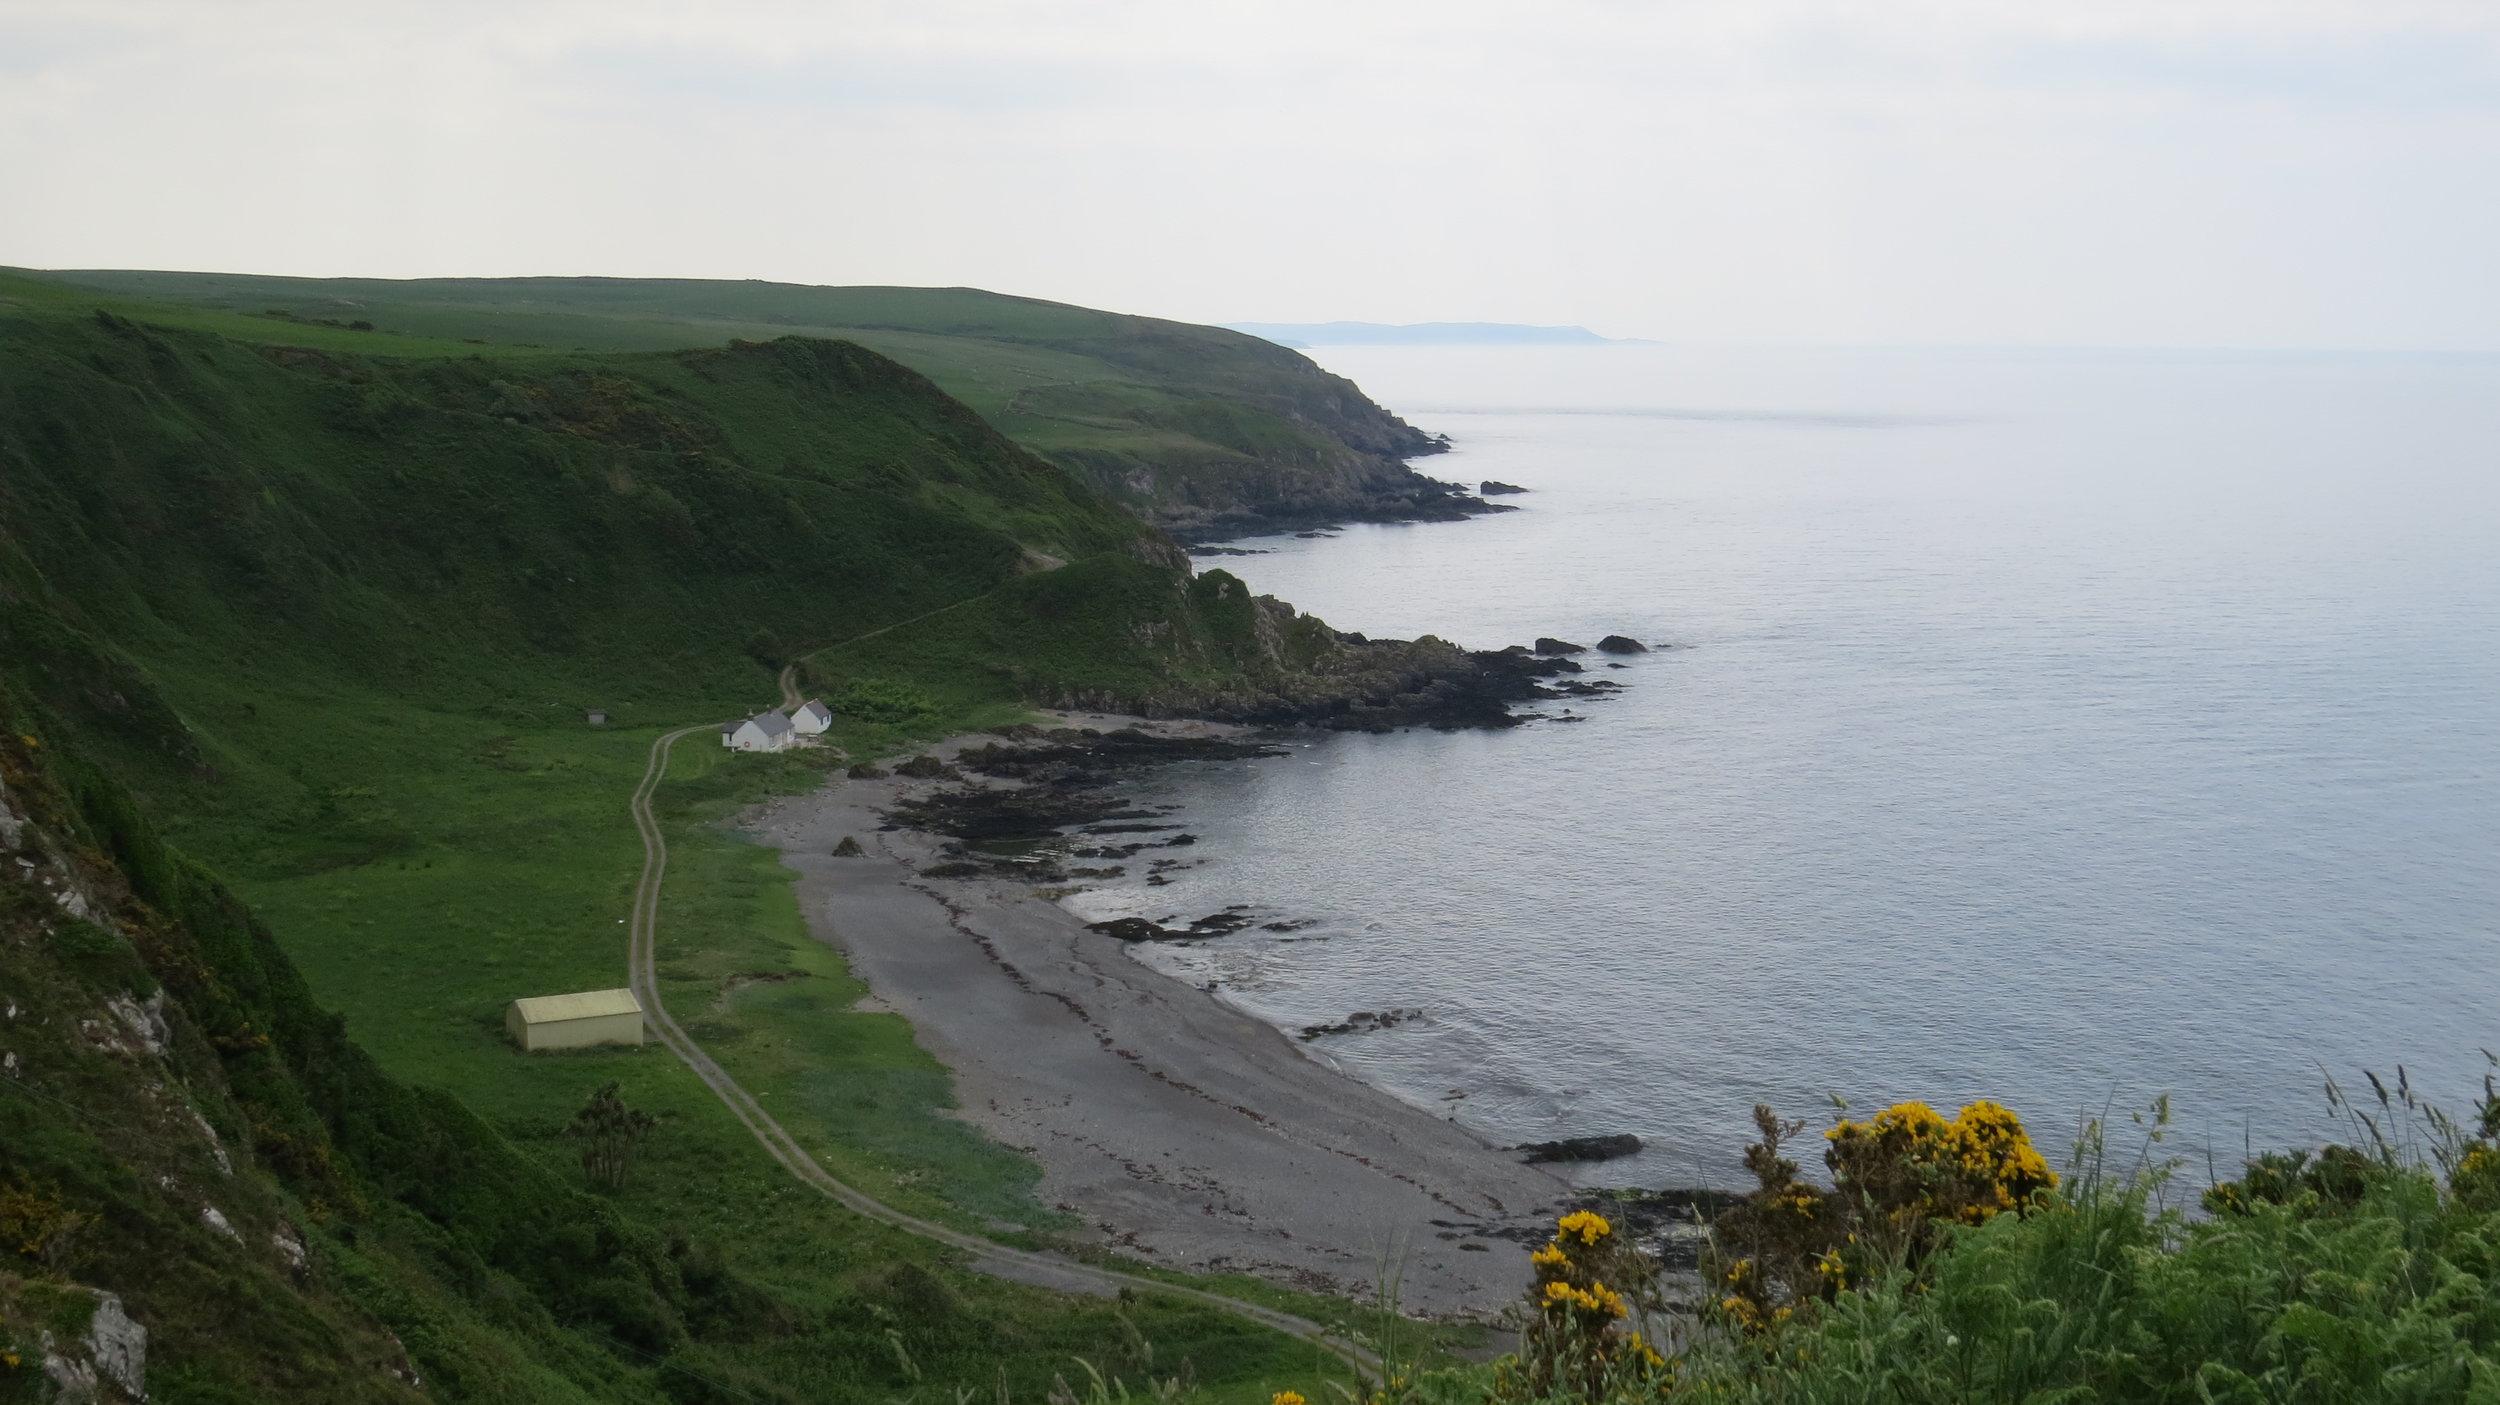 Morroch Bay